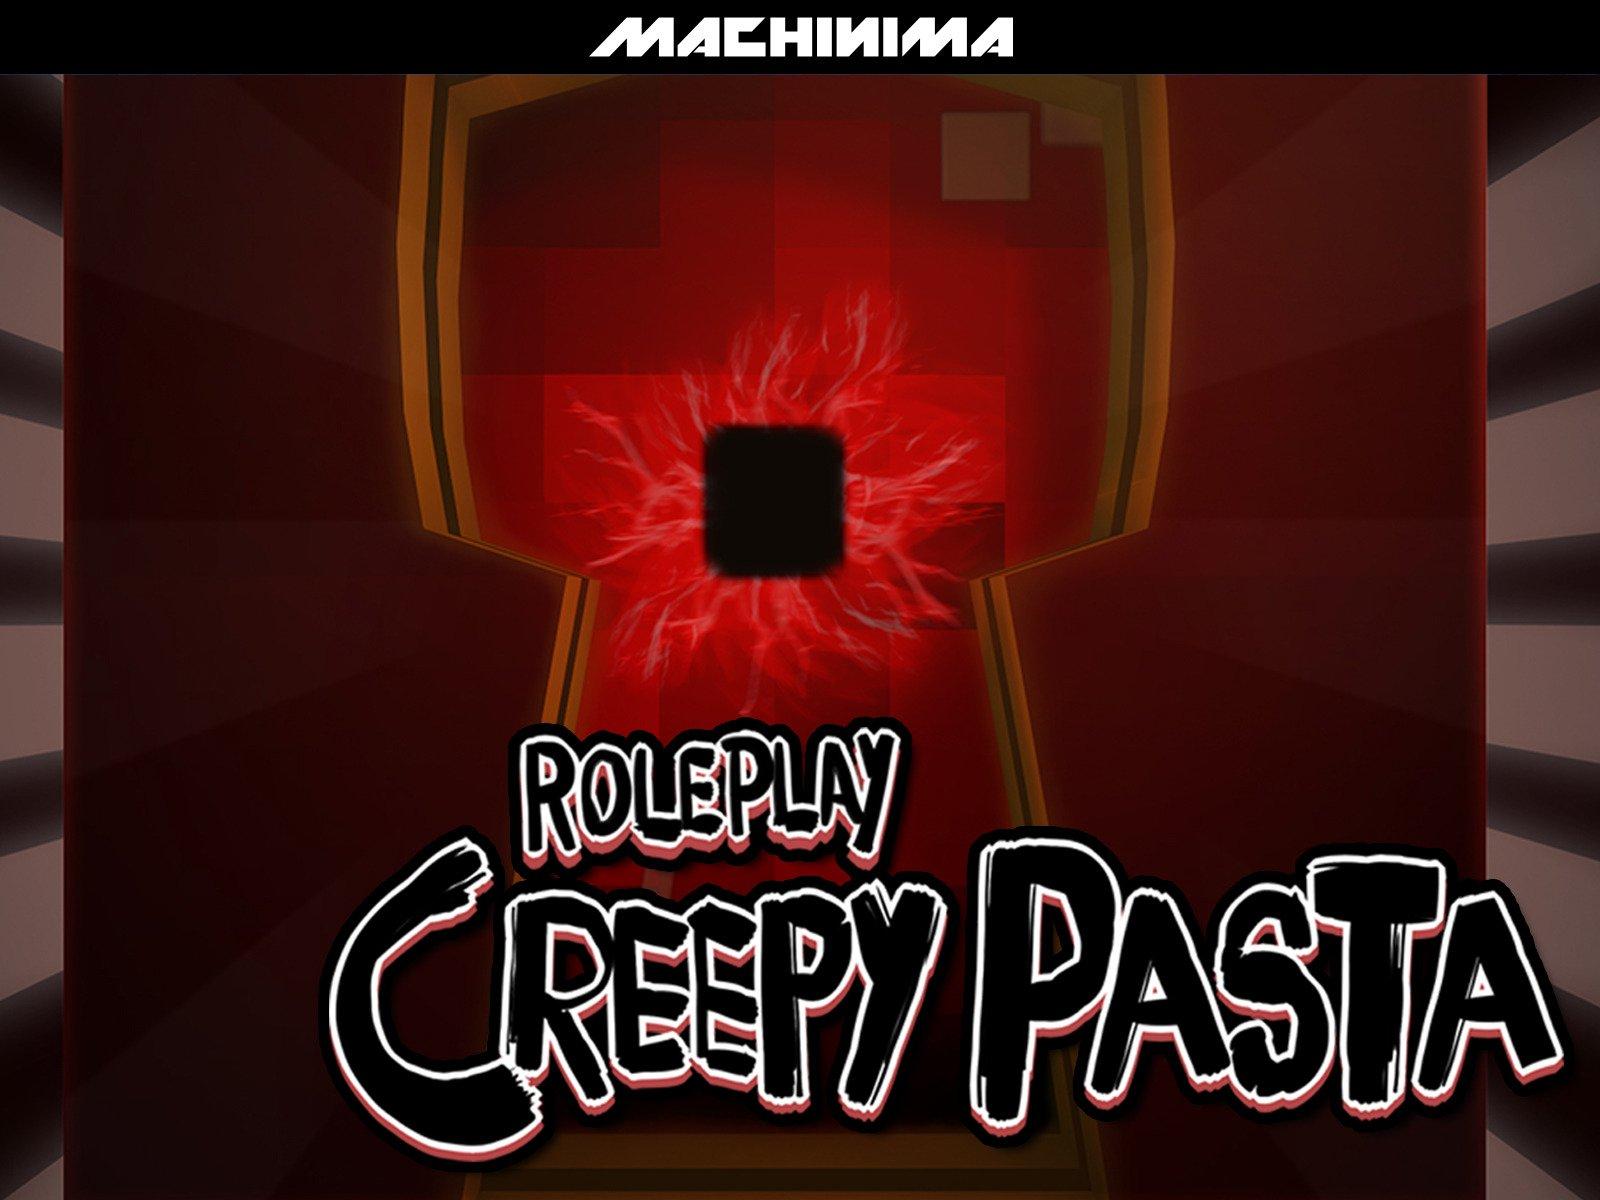 Roleplay Creepypasta on Amazon Prime Video UK